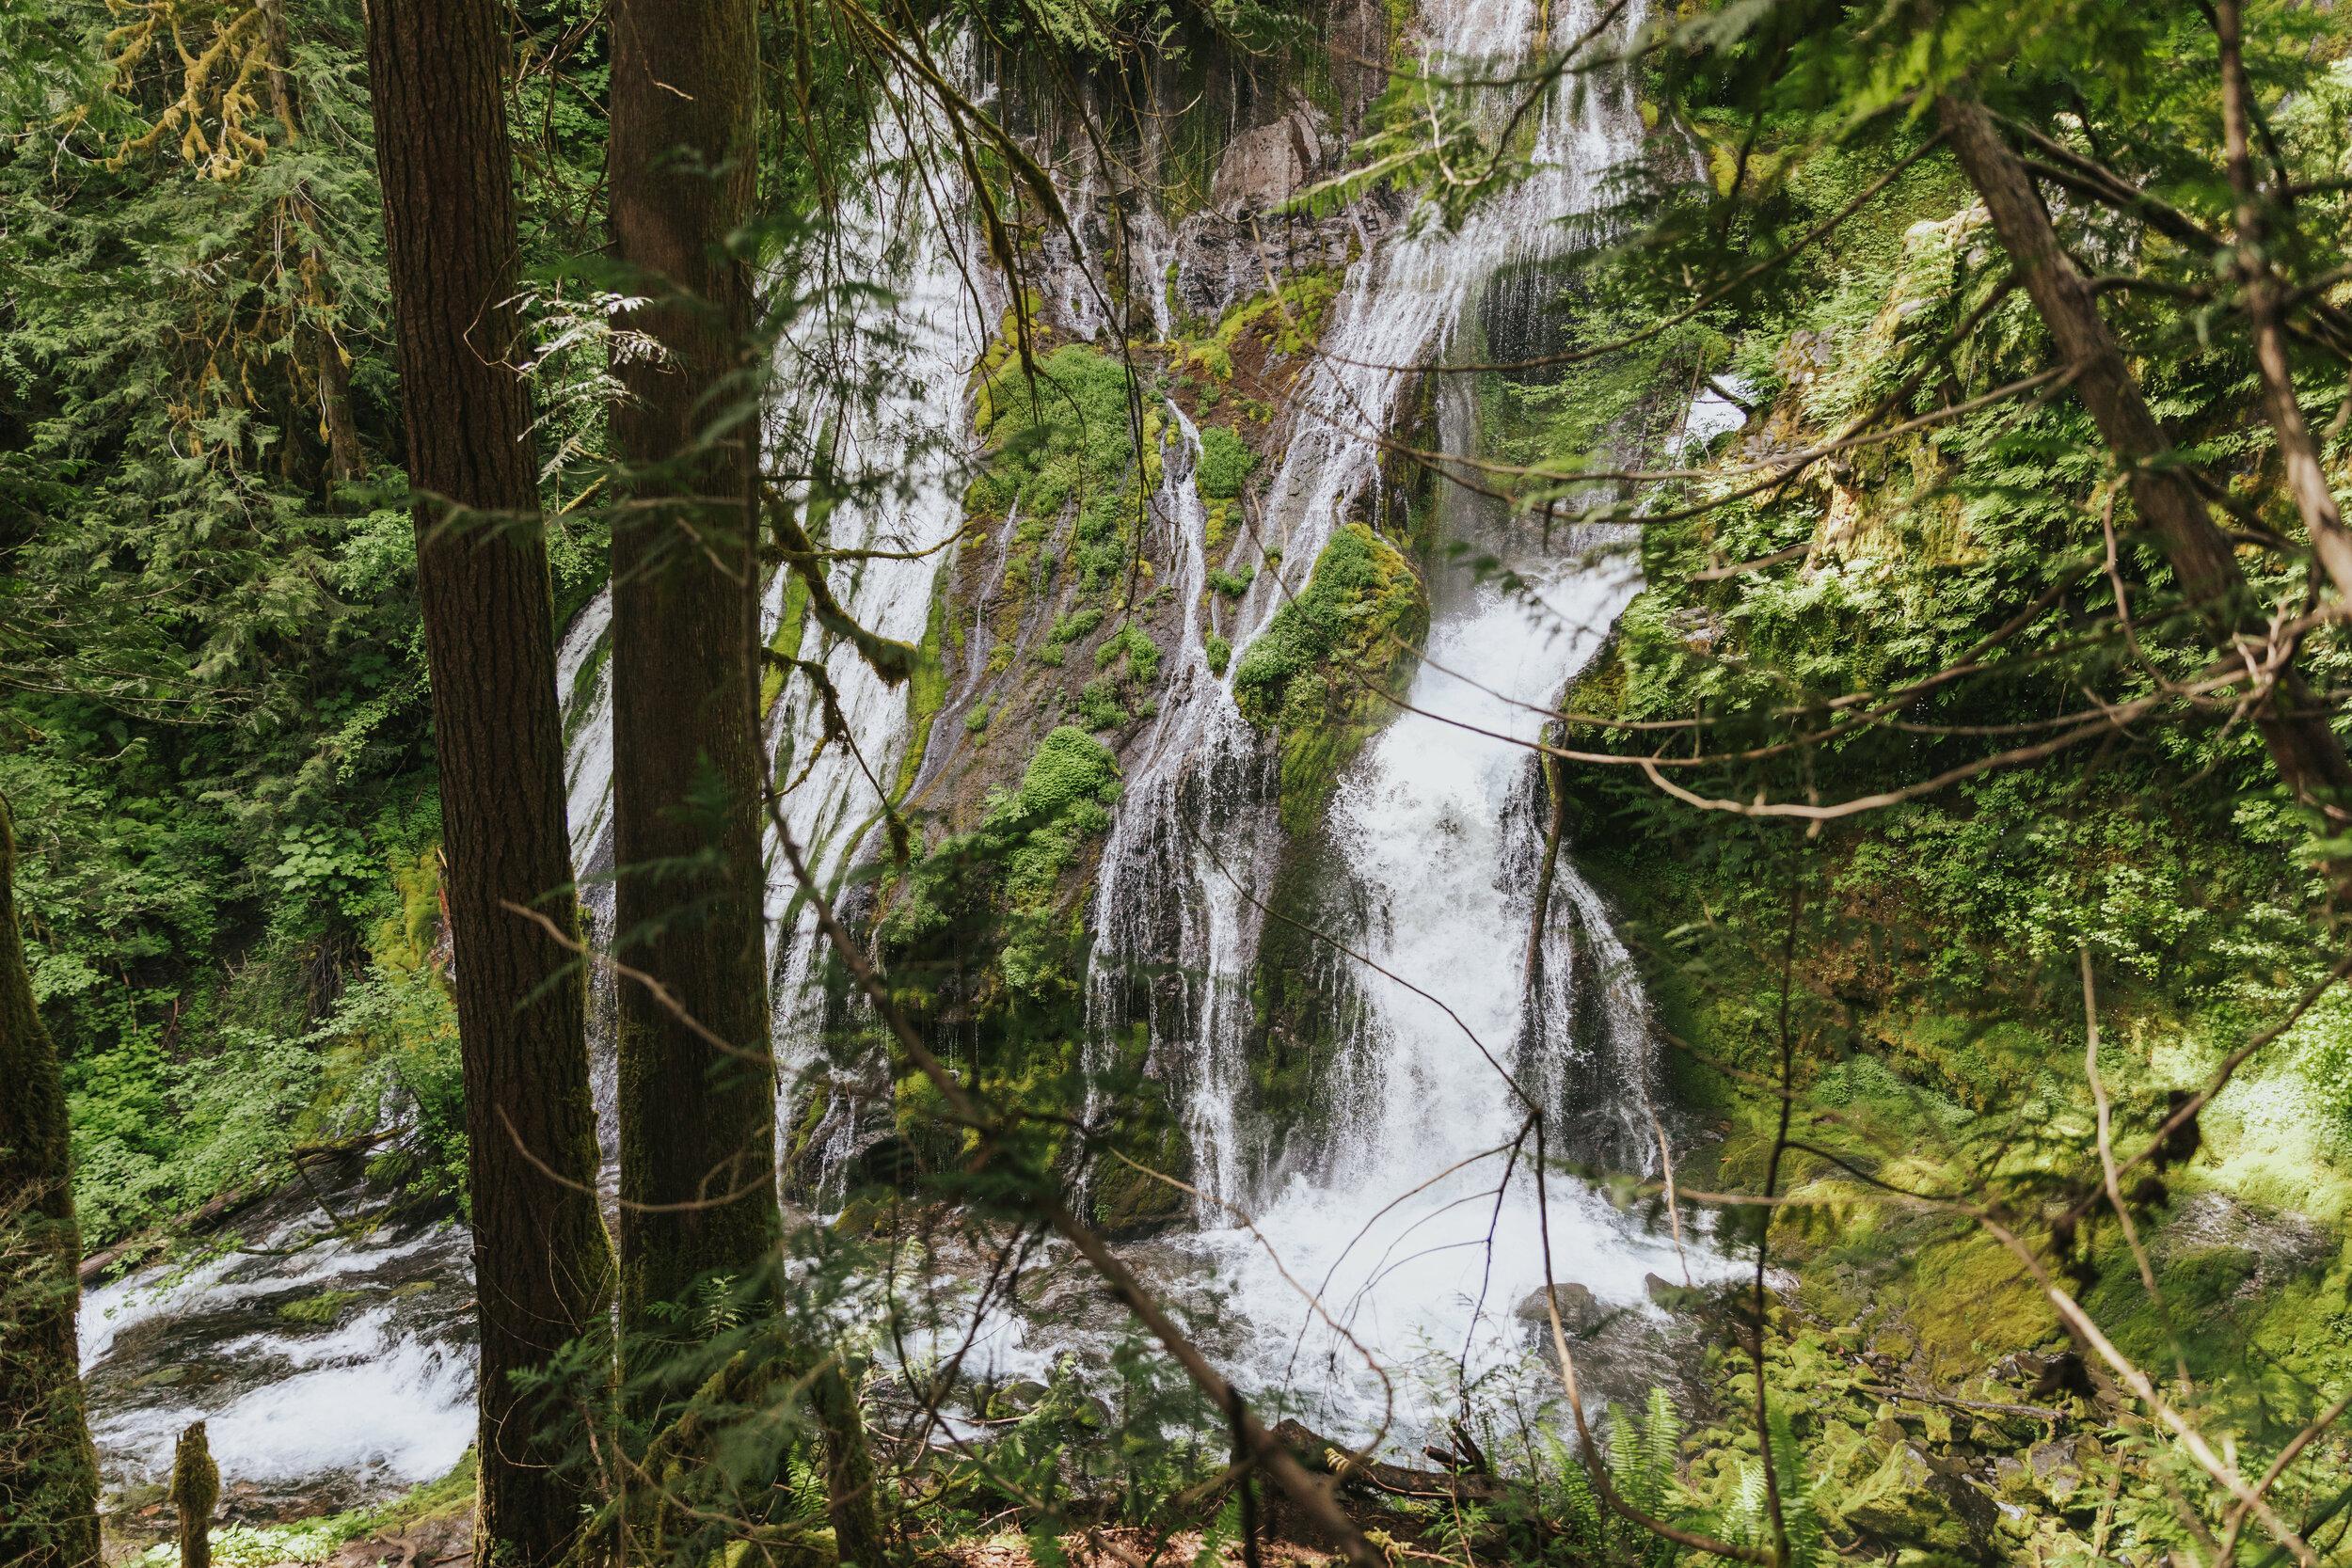 Marissa-Solini-Photography-Panther-Creek-Falls